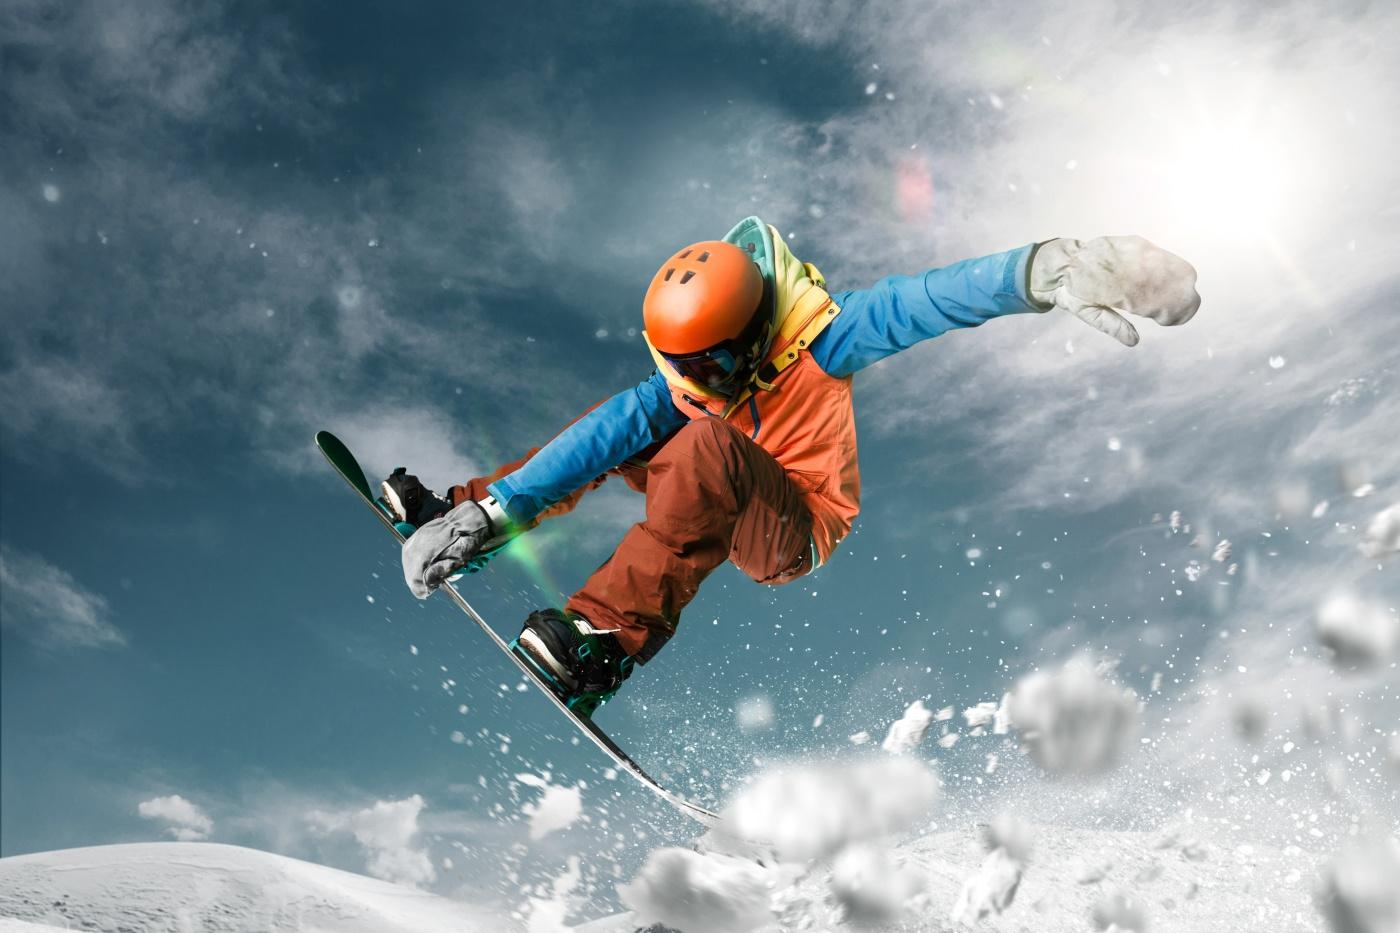 kids winter sports